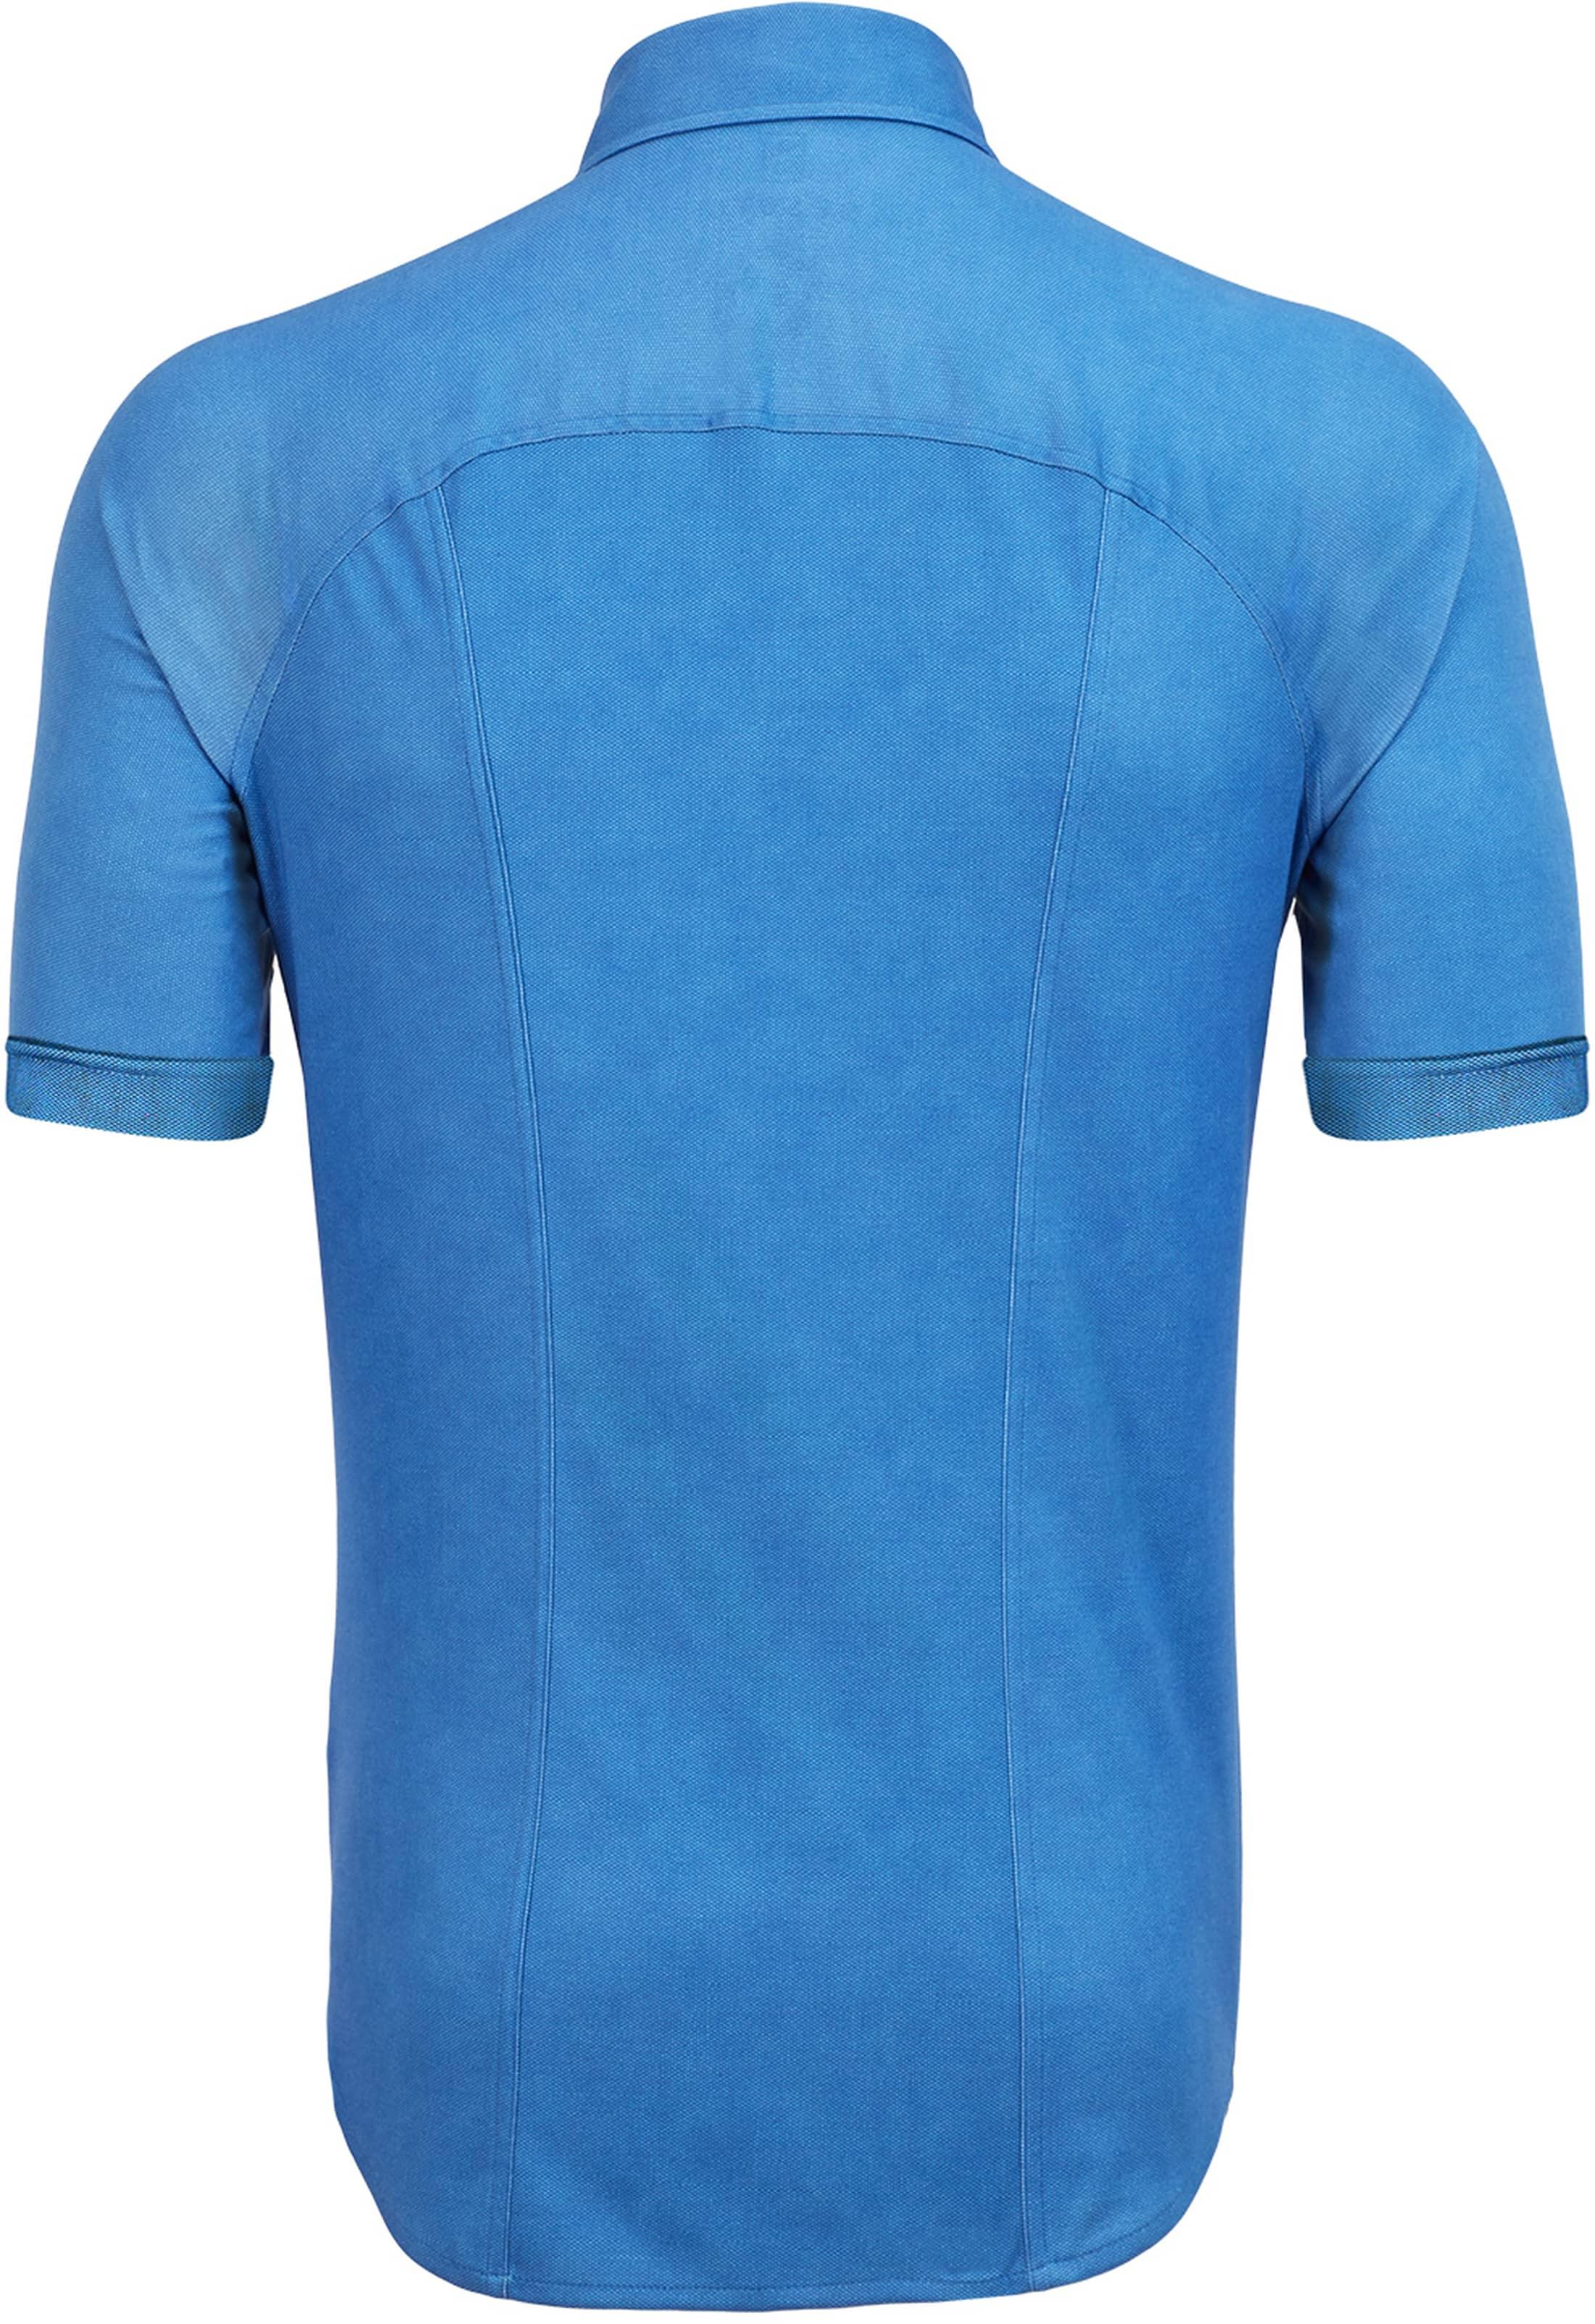 Desoto Overhemd Korte Mouw Blauw foto 1